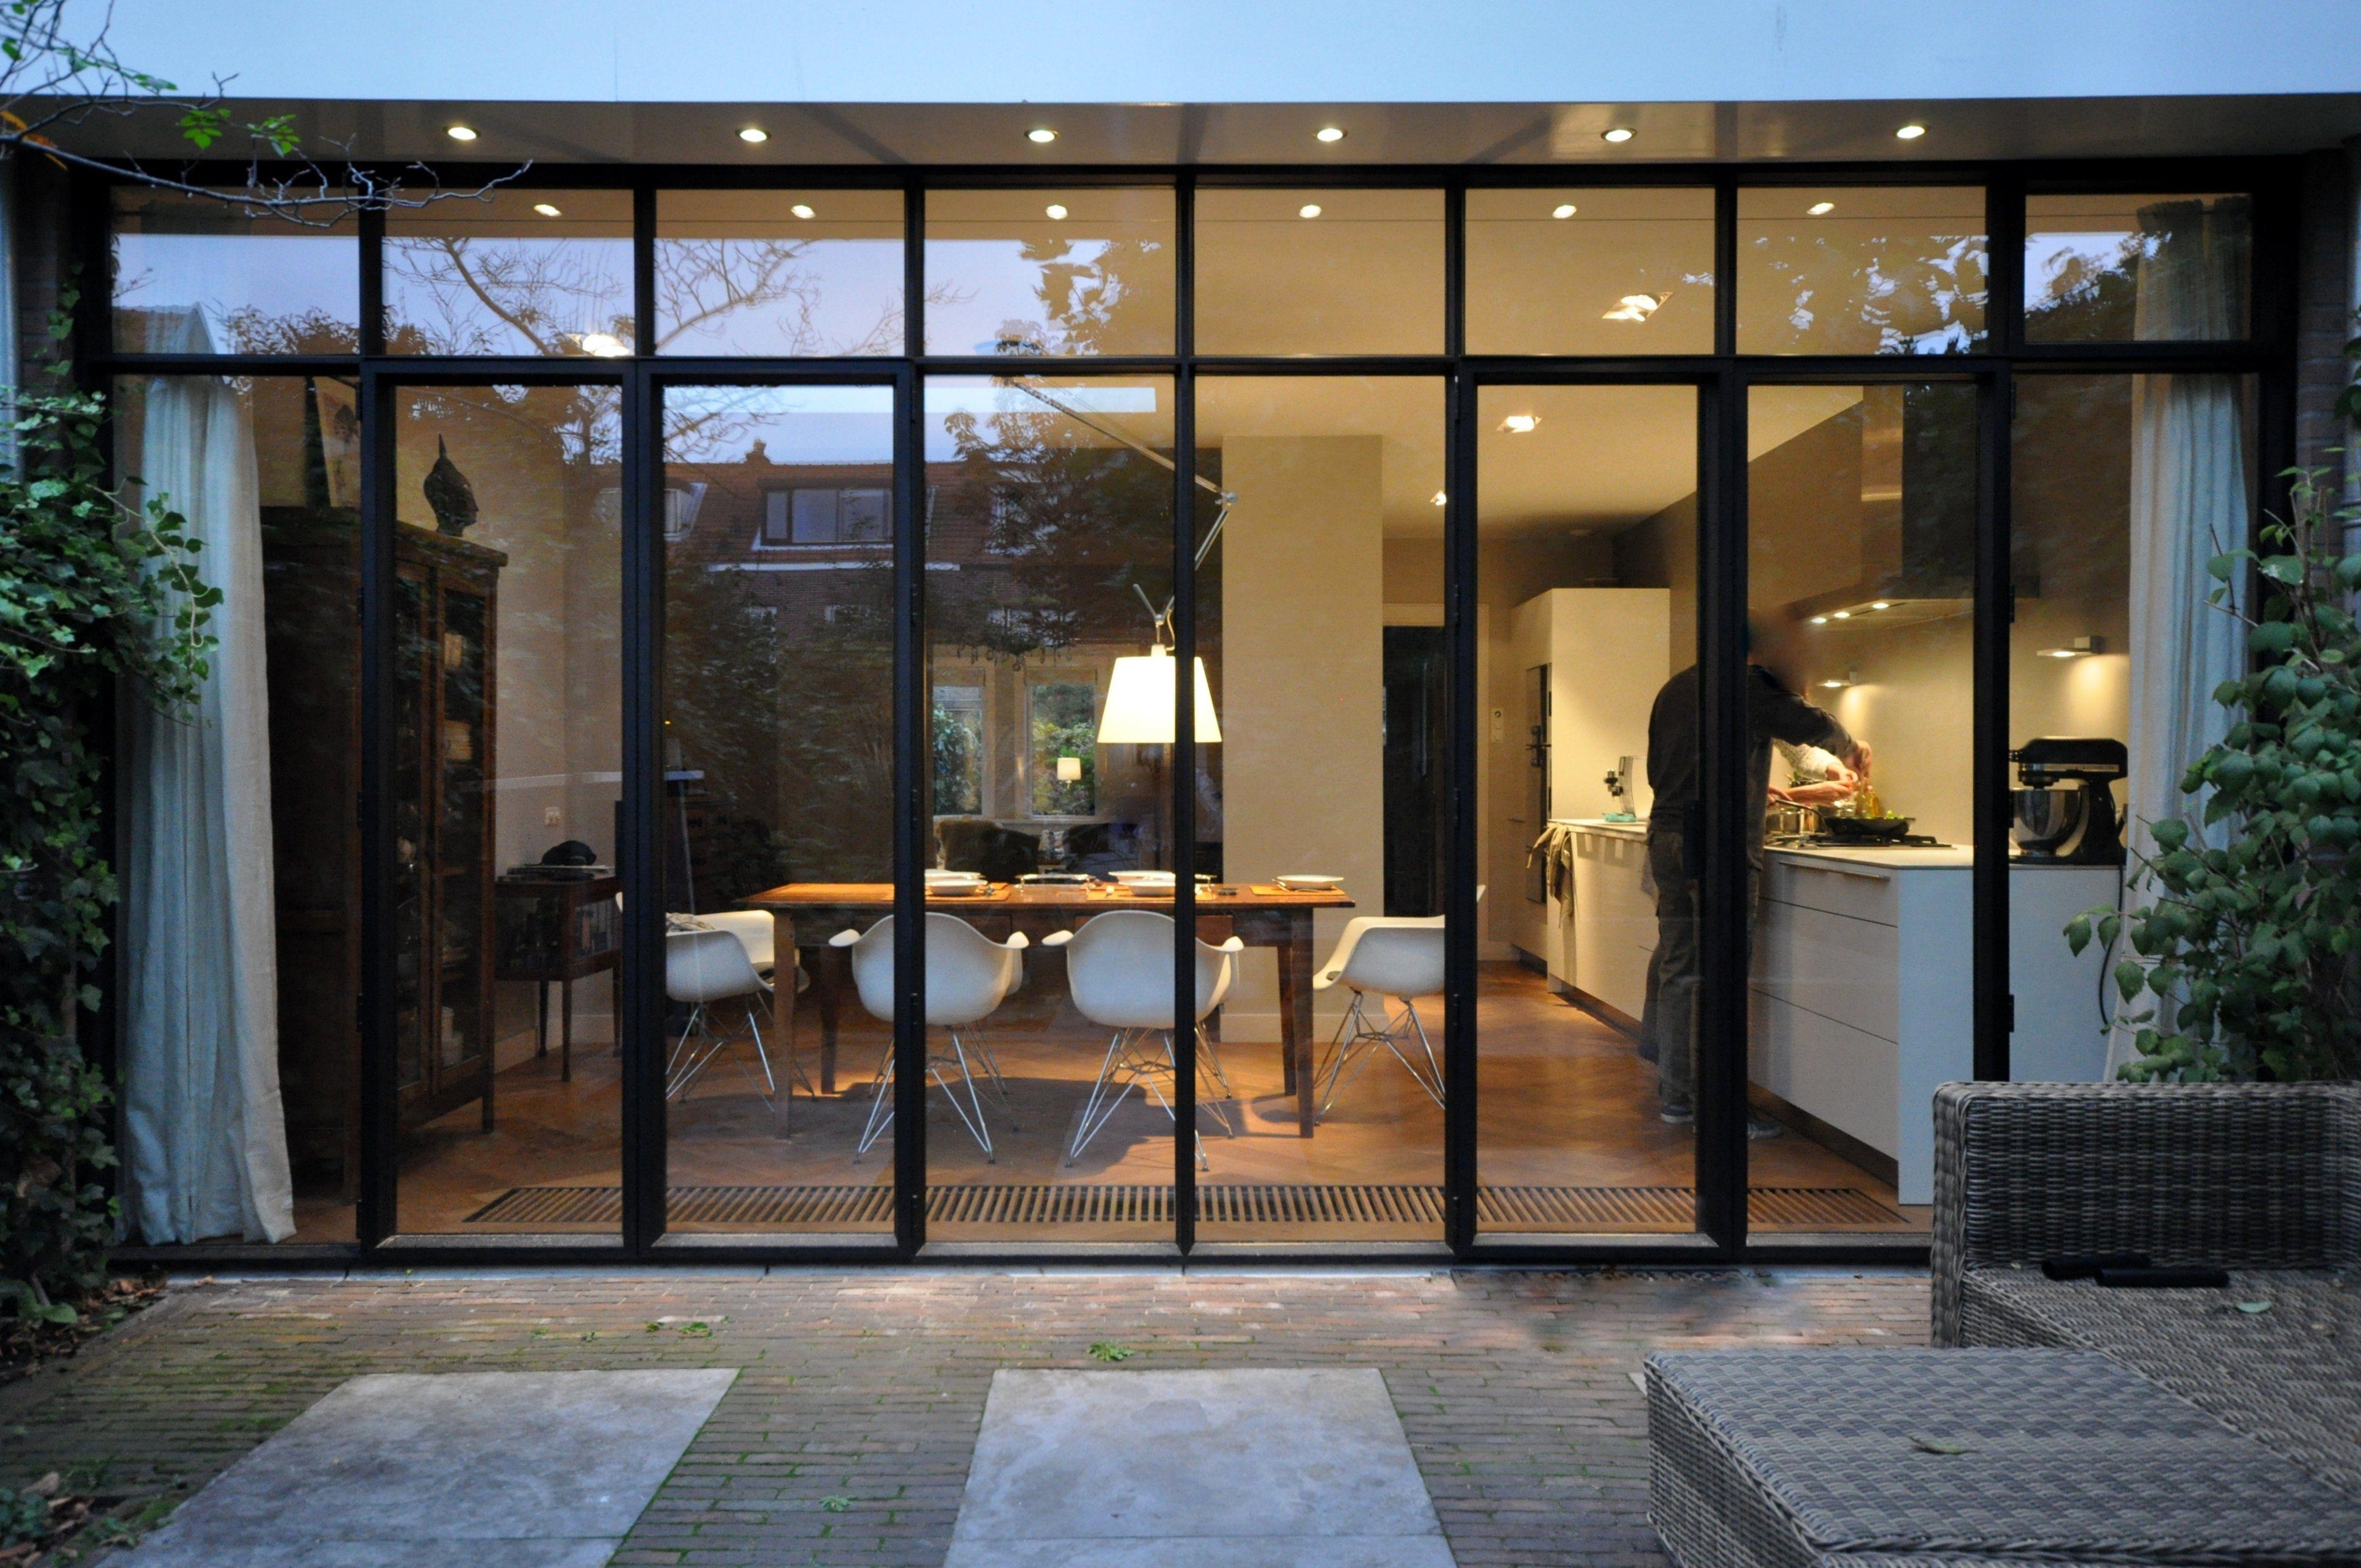 Modern Interieur Herenhuis : Frank weil jaren herenhuis aanbouw zwart aluminium pui